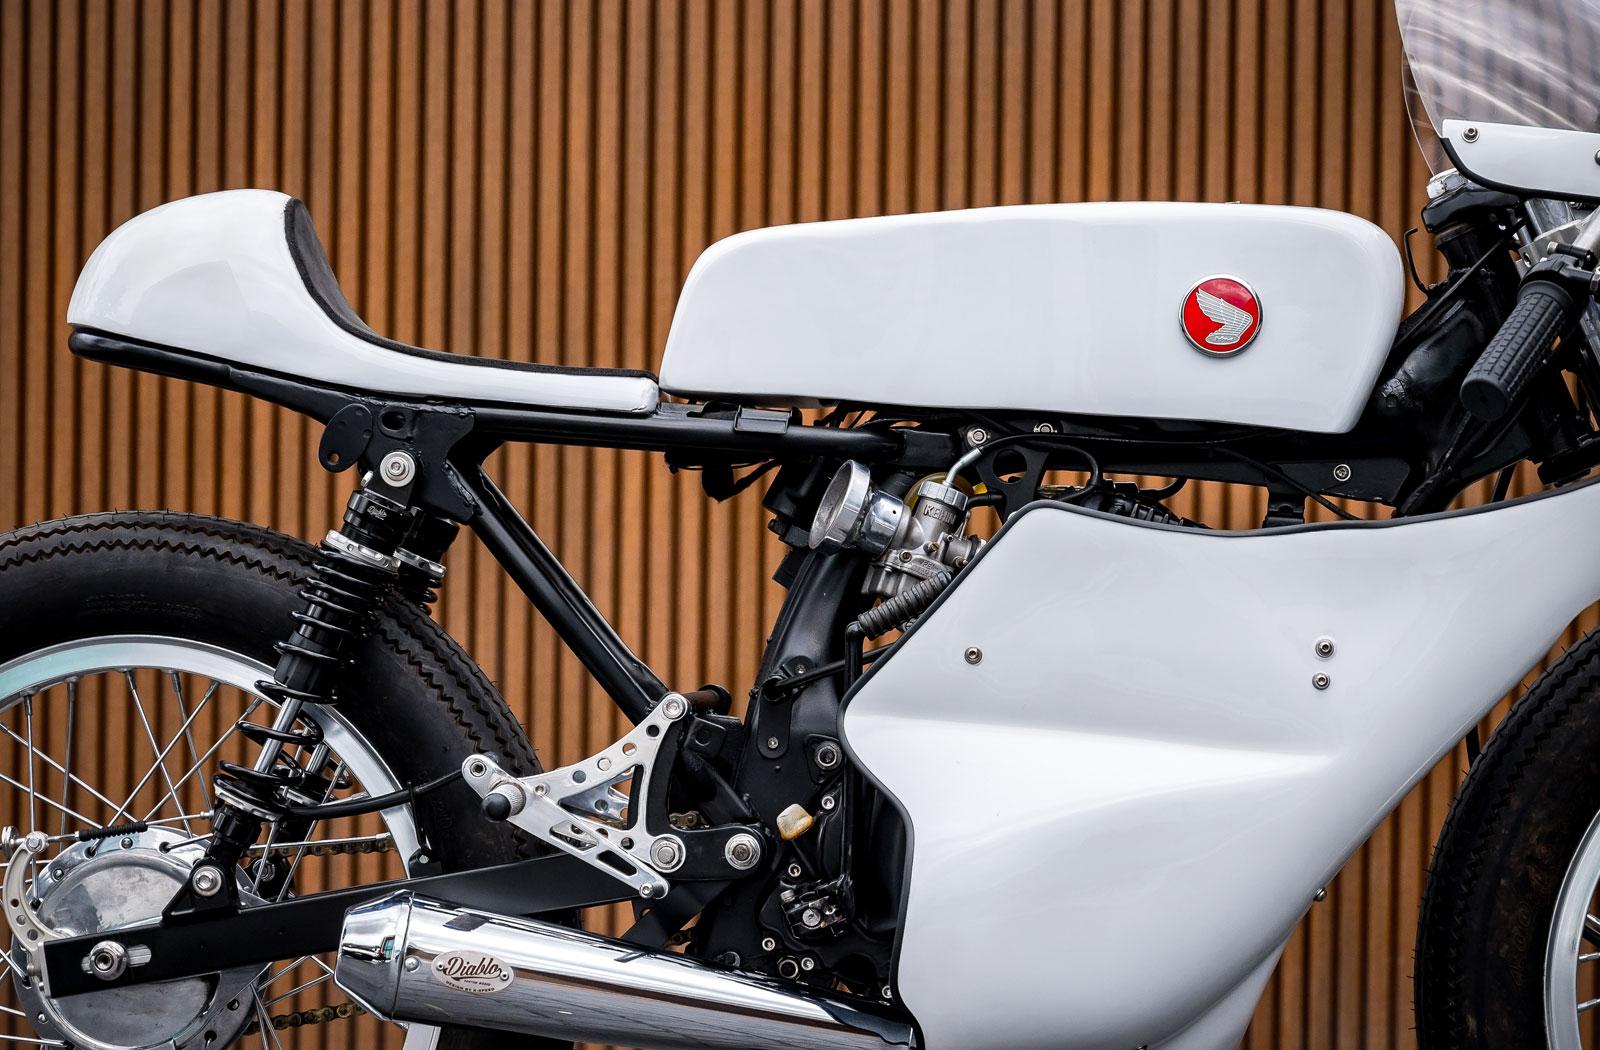 K-Speed Honda 125 racing fairing